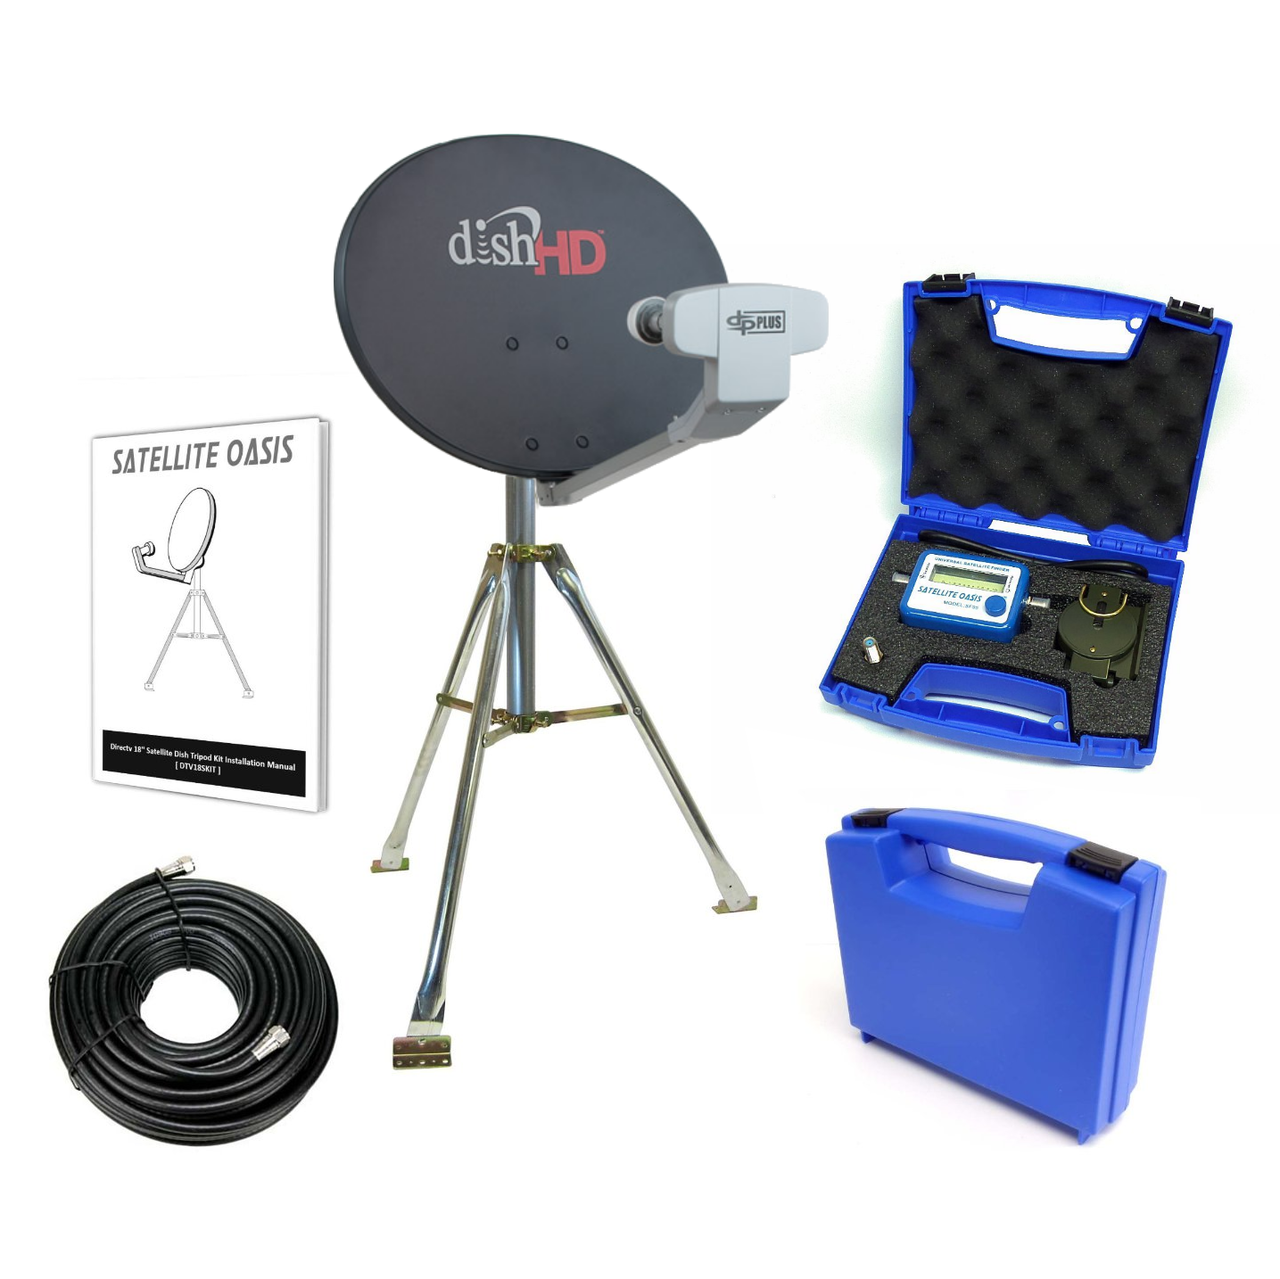 Dish Network For Rv >> Dish Network 1000 2 Turbo Hdtv Rv Satellite Tripod Kit